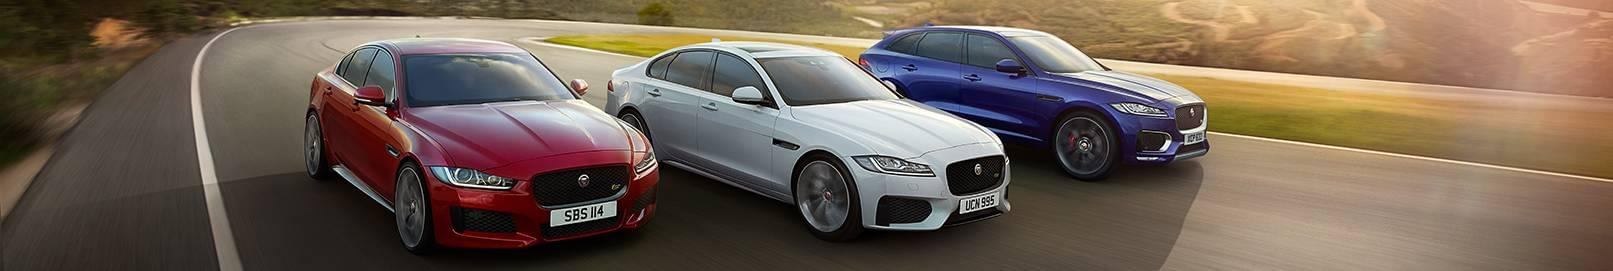 Jaguar Line up Driving